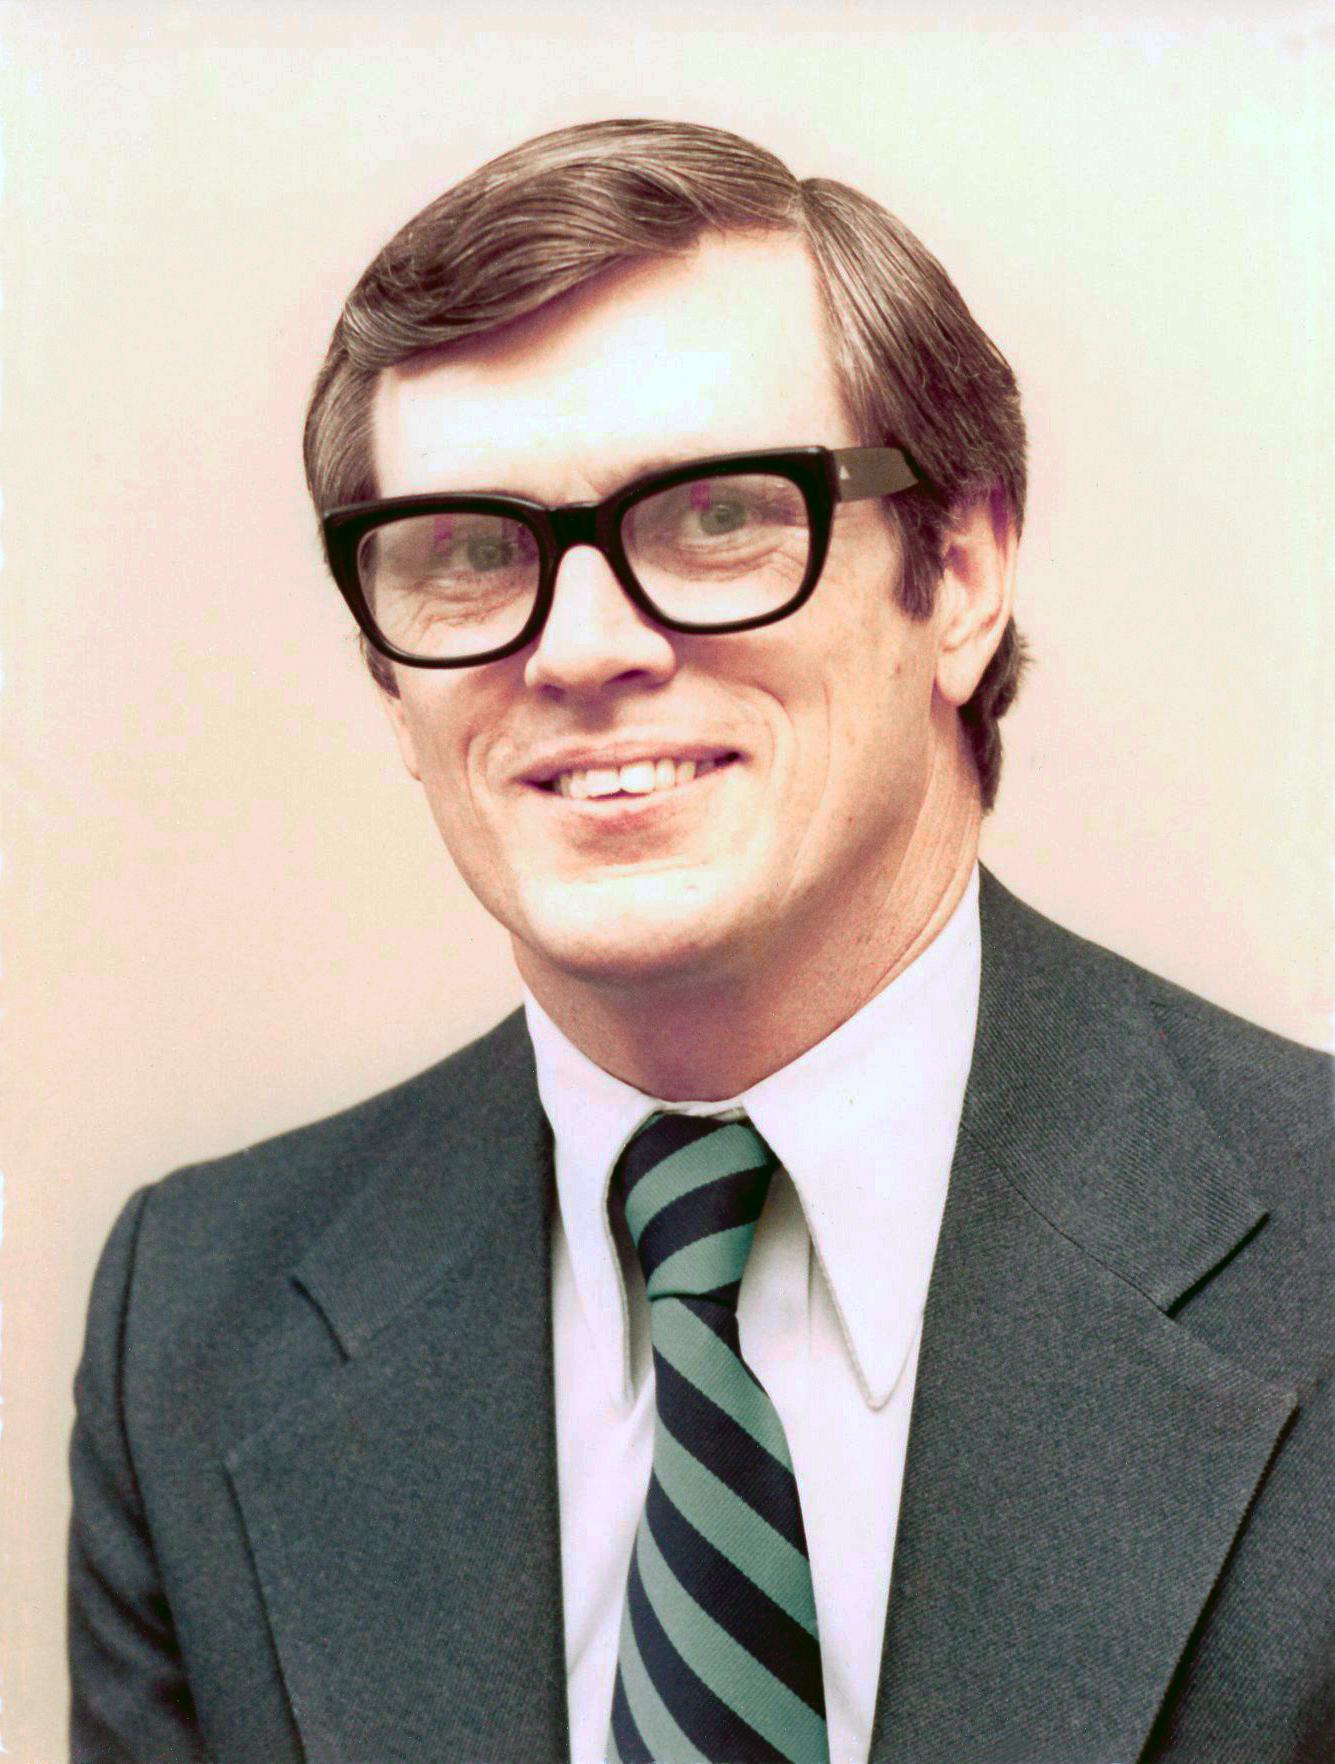 Charles Erickson (1974-1975)